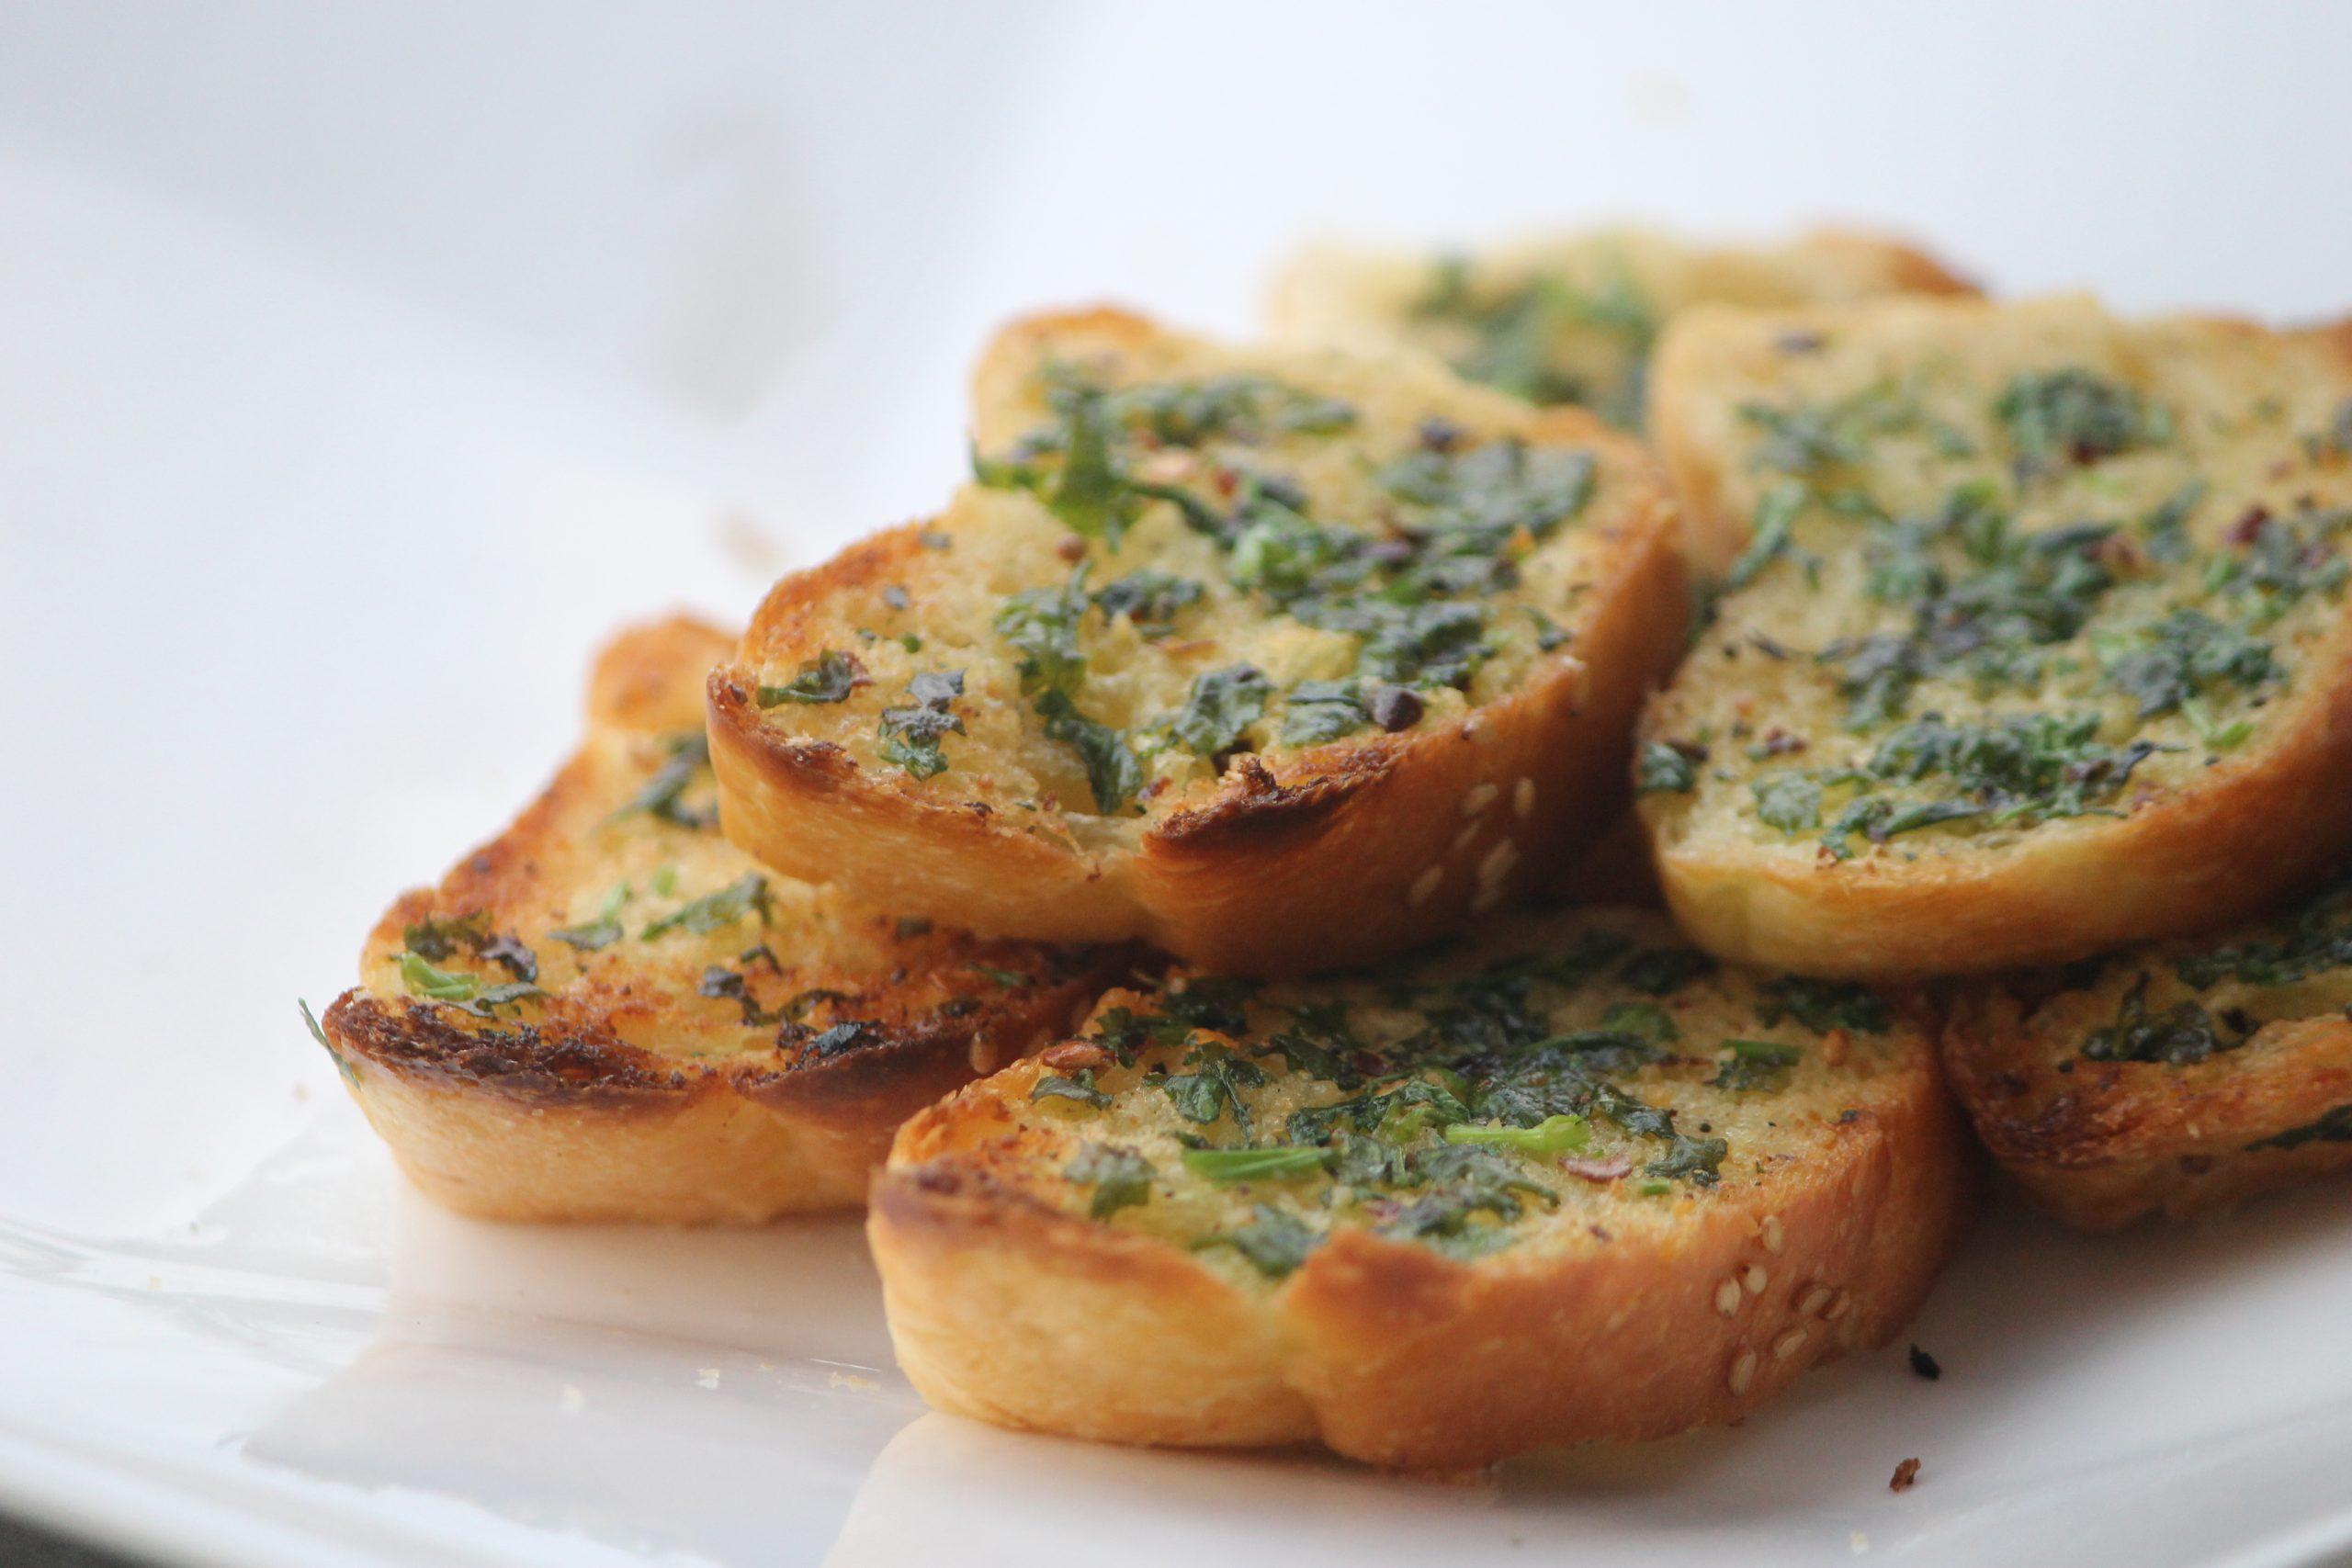 Garlic bread for breakfast